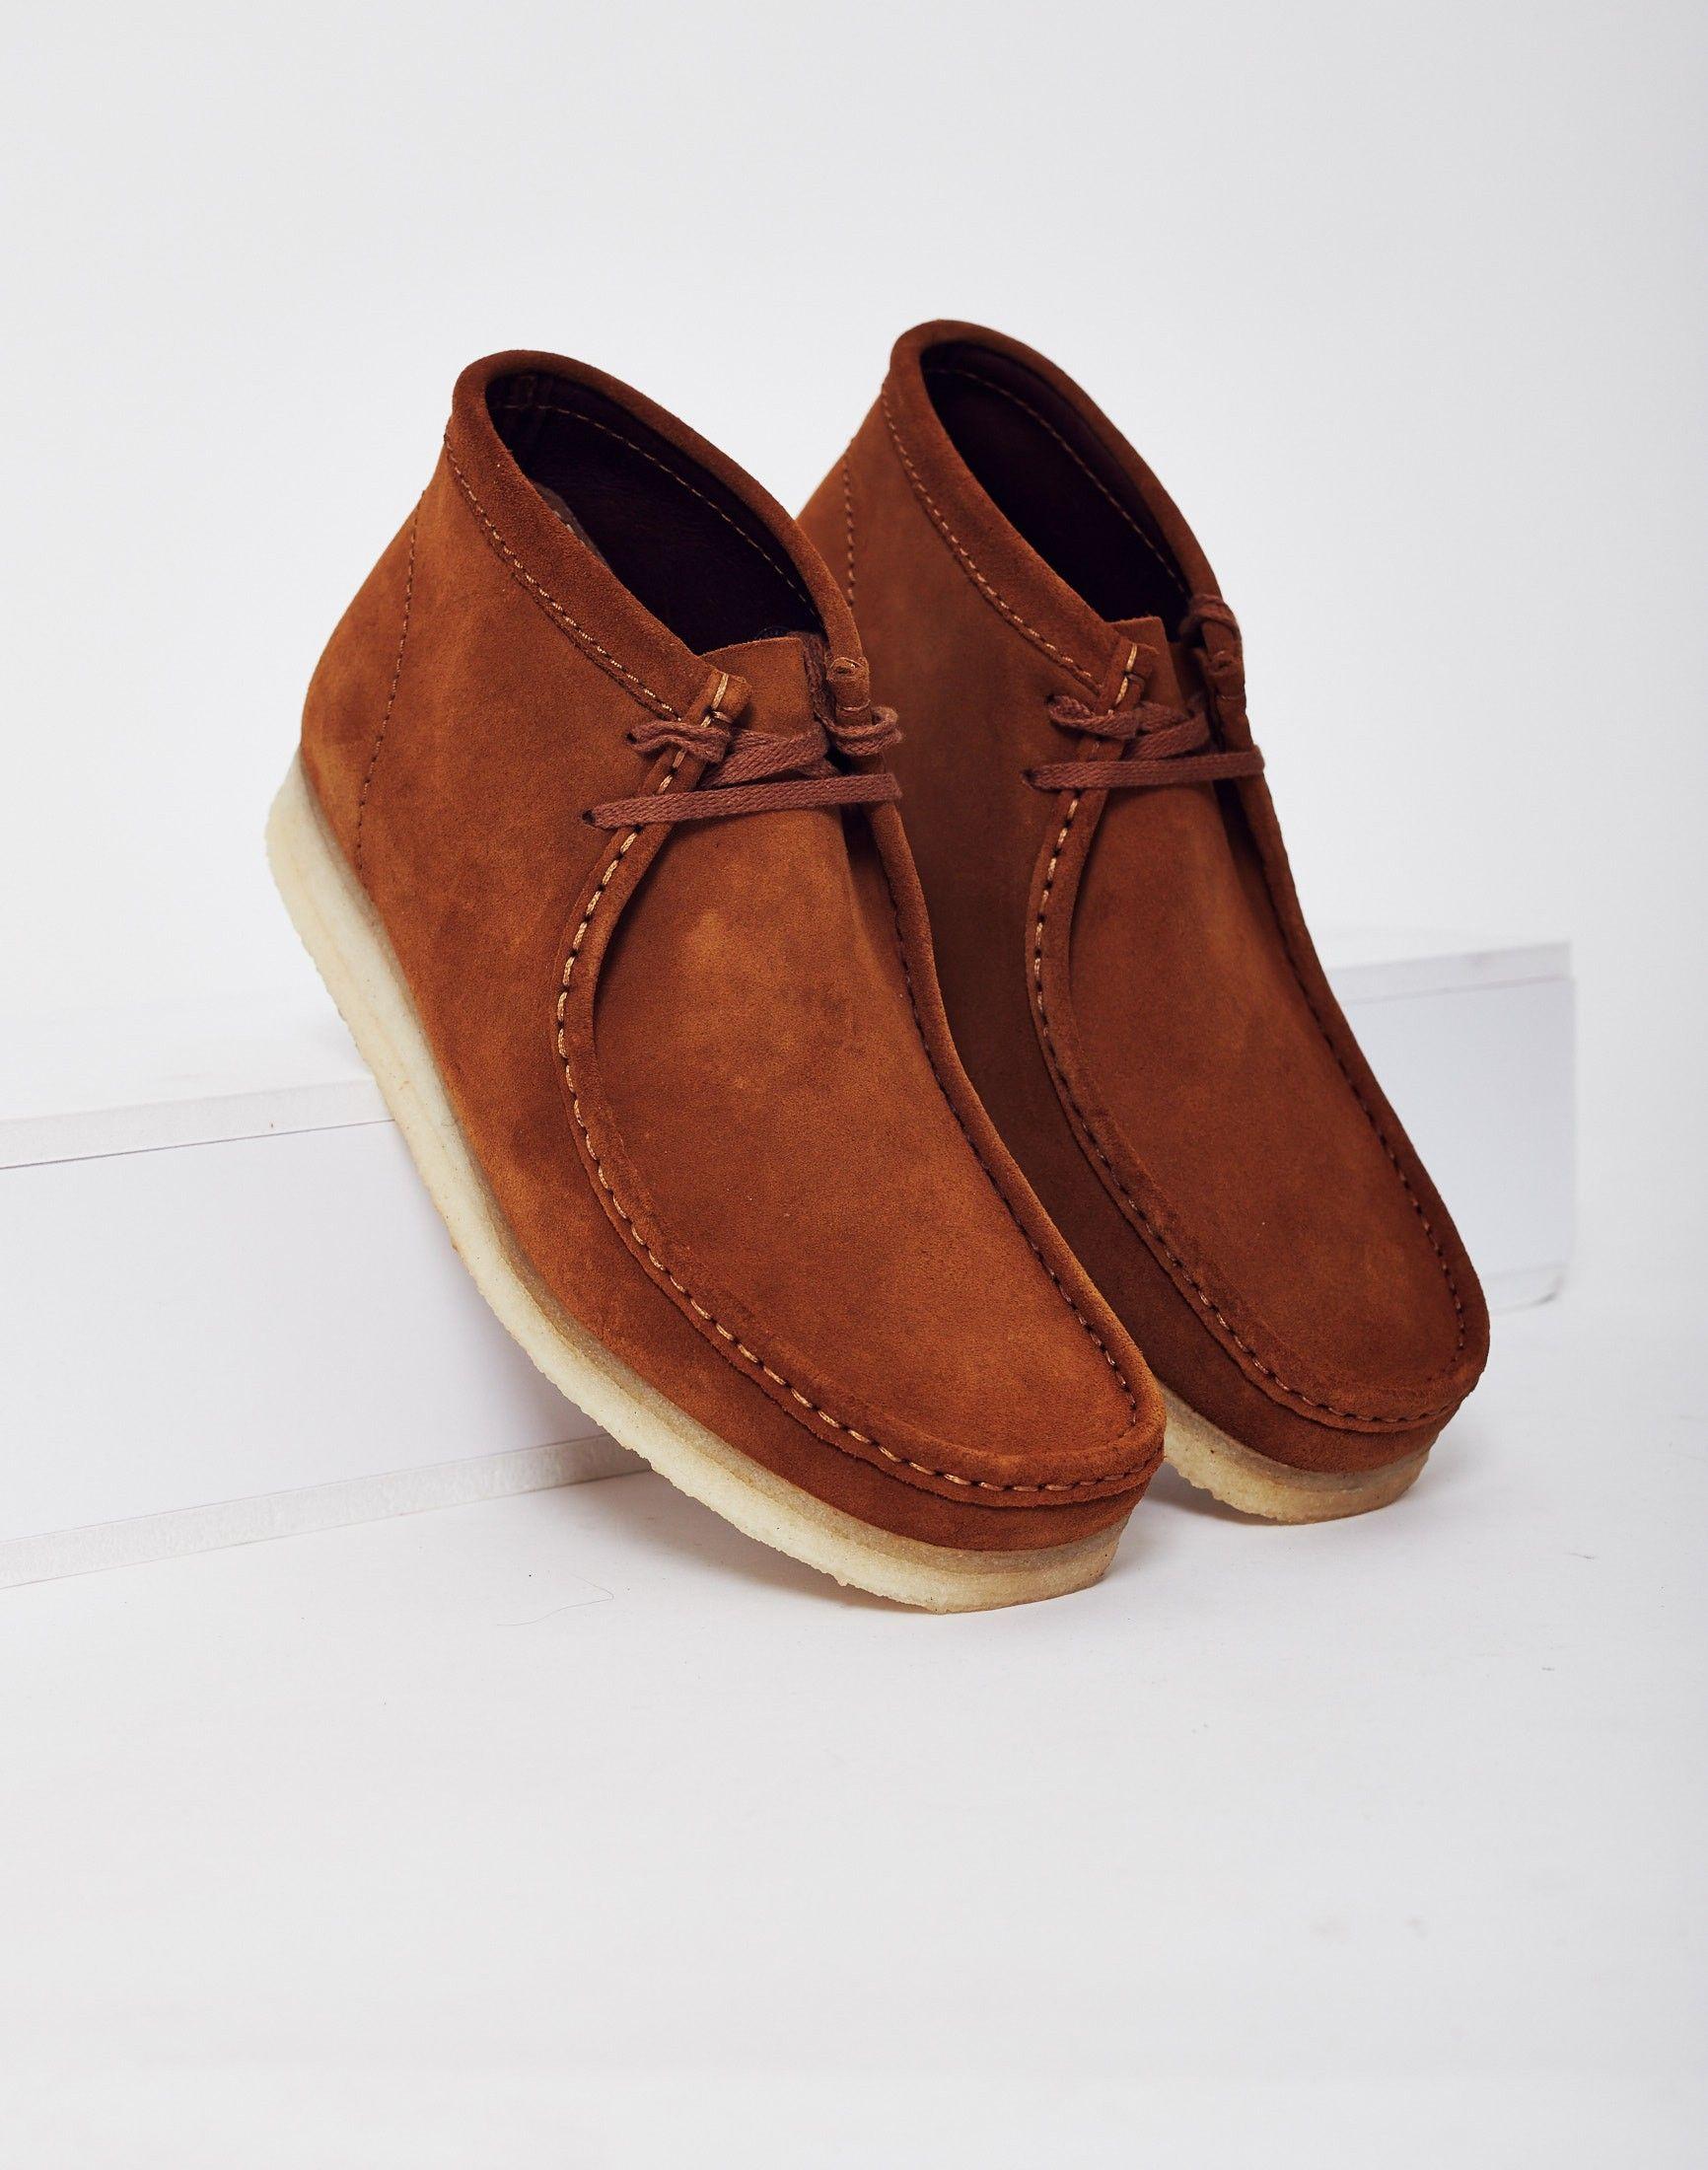 Clarks Originals Suede Wallabee Boot Brown